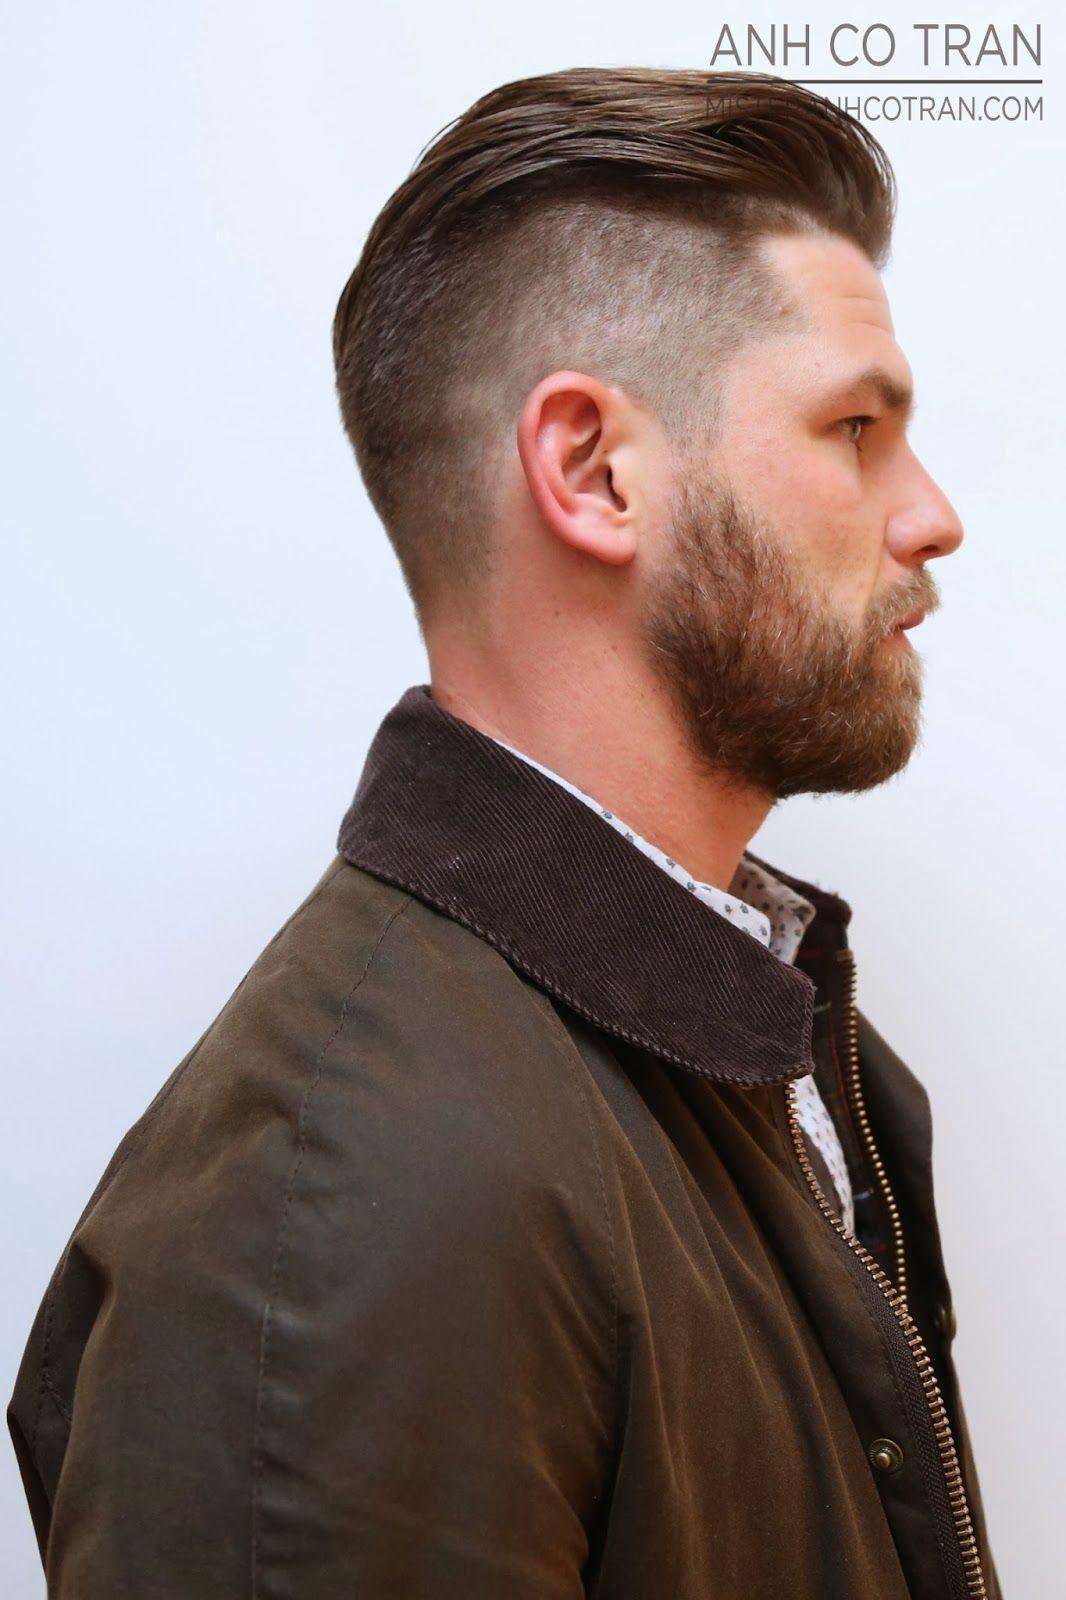 La The Best Mens Cuts Are At Ramireztran Salon Cutstyle Anh Co